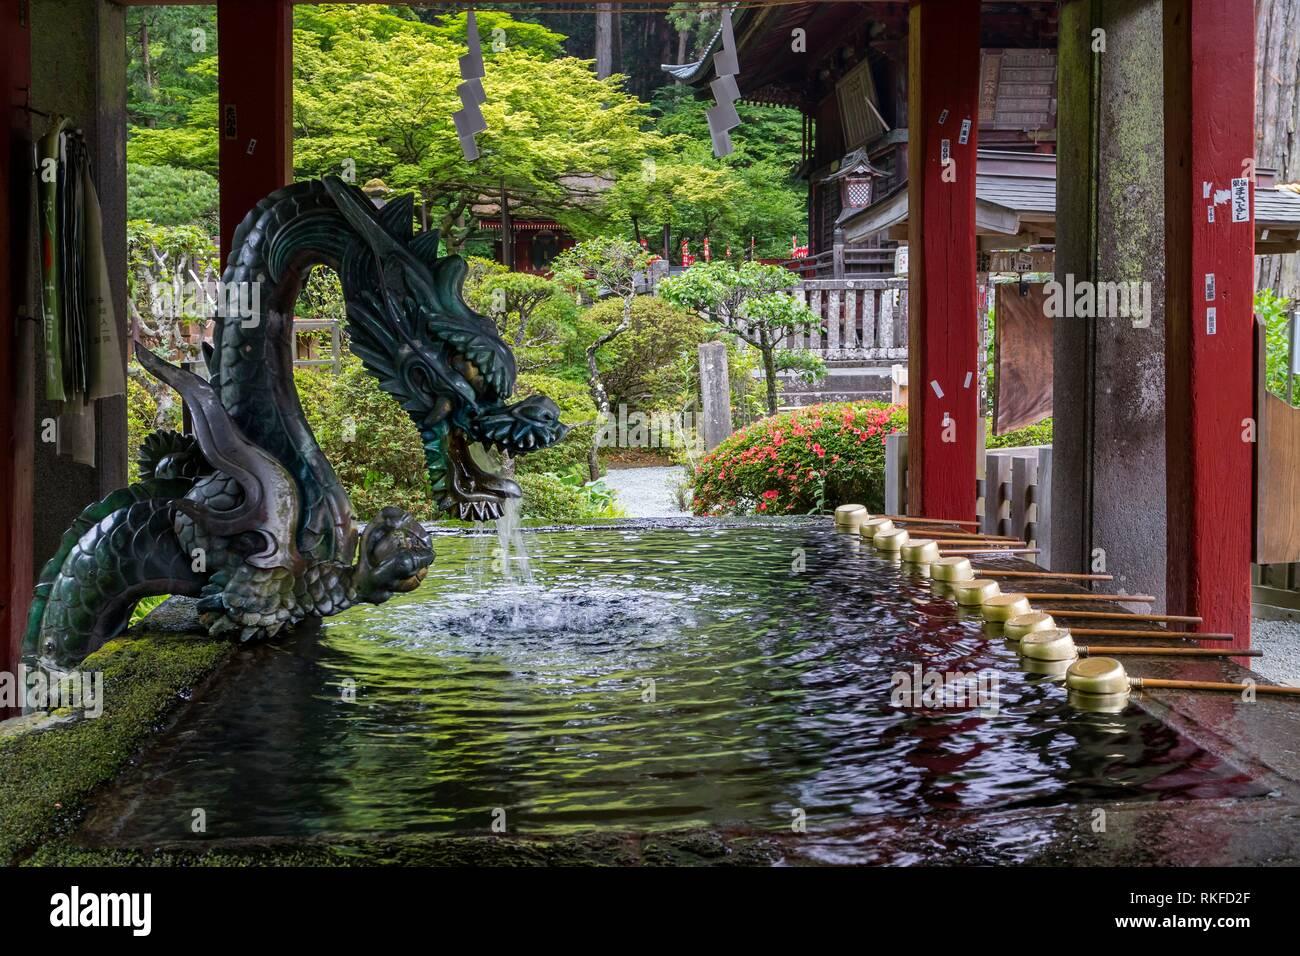 Purification basin with a water dragon at Fujiyoshida Sengen Shrine in Fujiyoshida city. - Stock Image